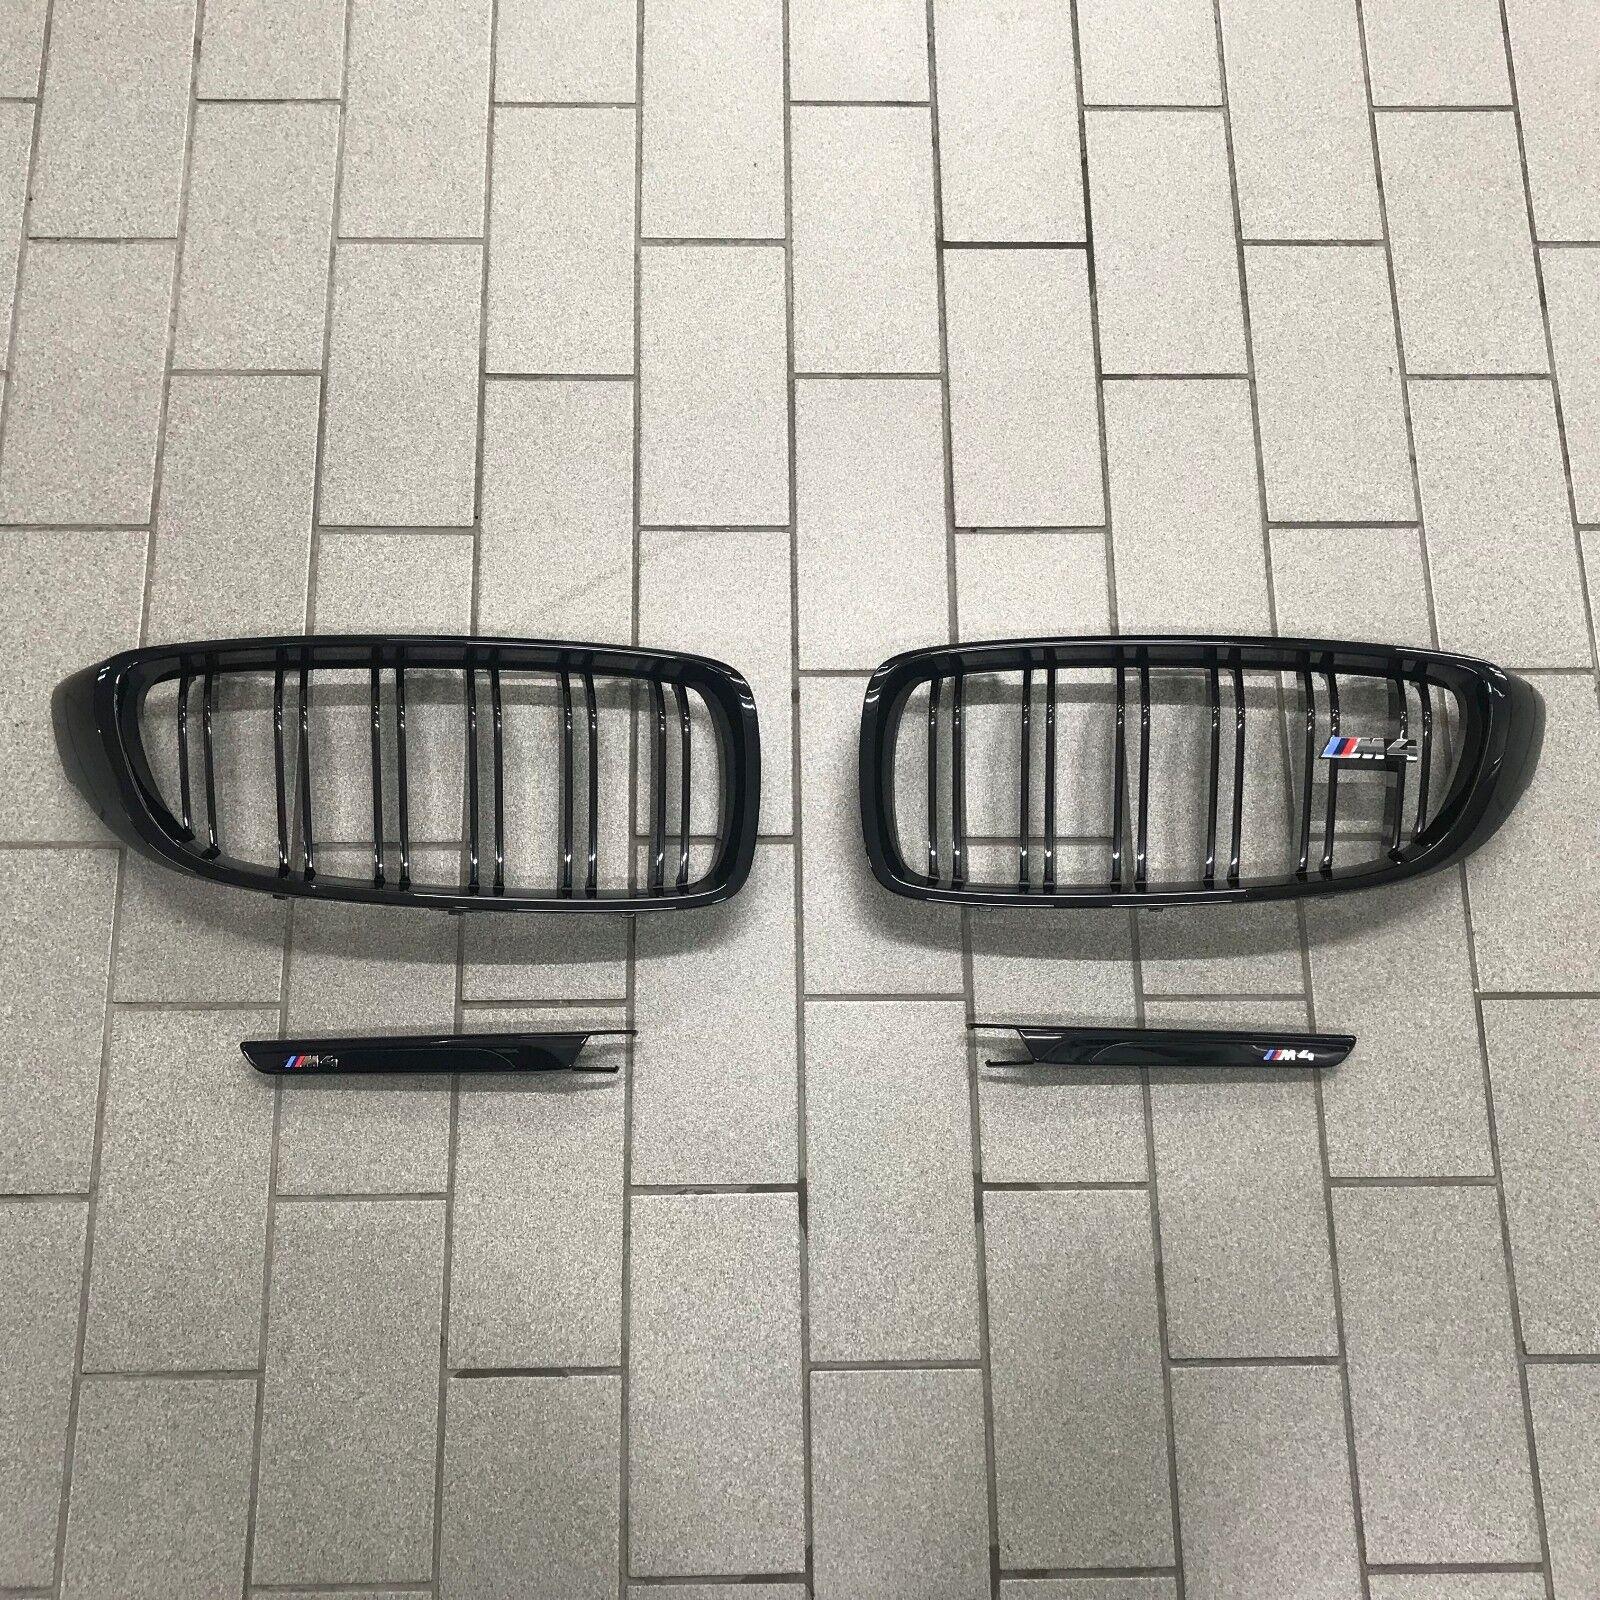 BMW F32 F33 F80 F82 F83 M3 M4 Gloss Black Kidney Grille Grilles Double Spoke UK